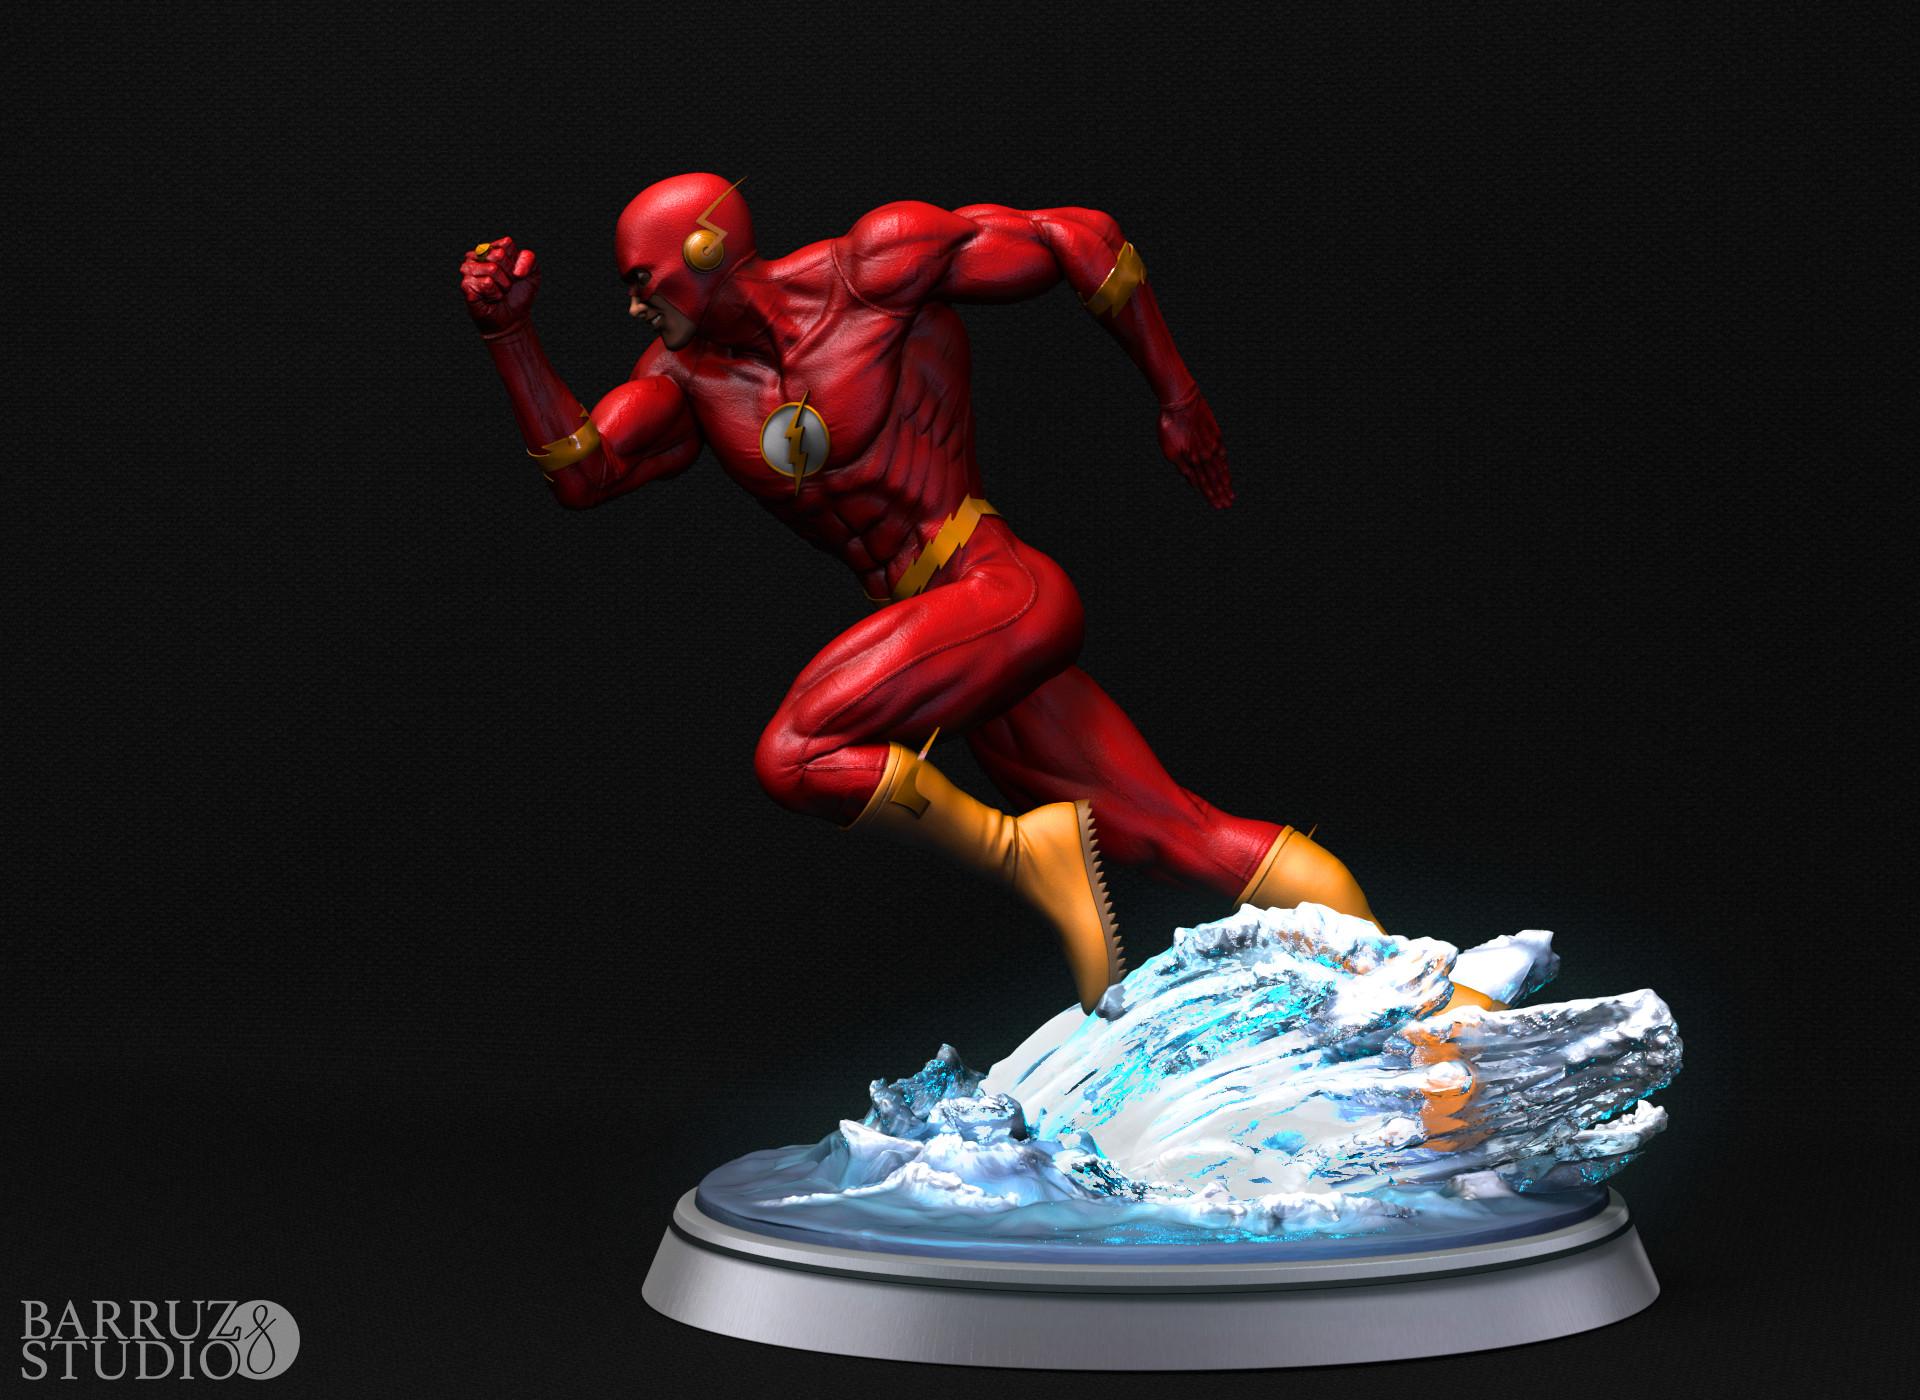 David fernandez barruz 0003 flash overwater 04